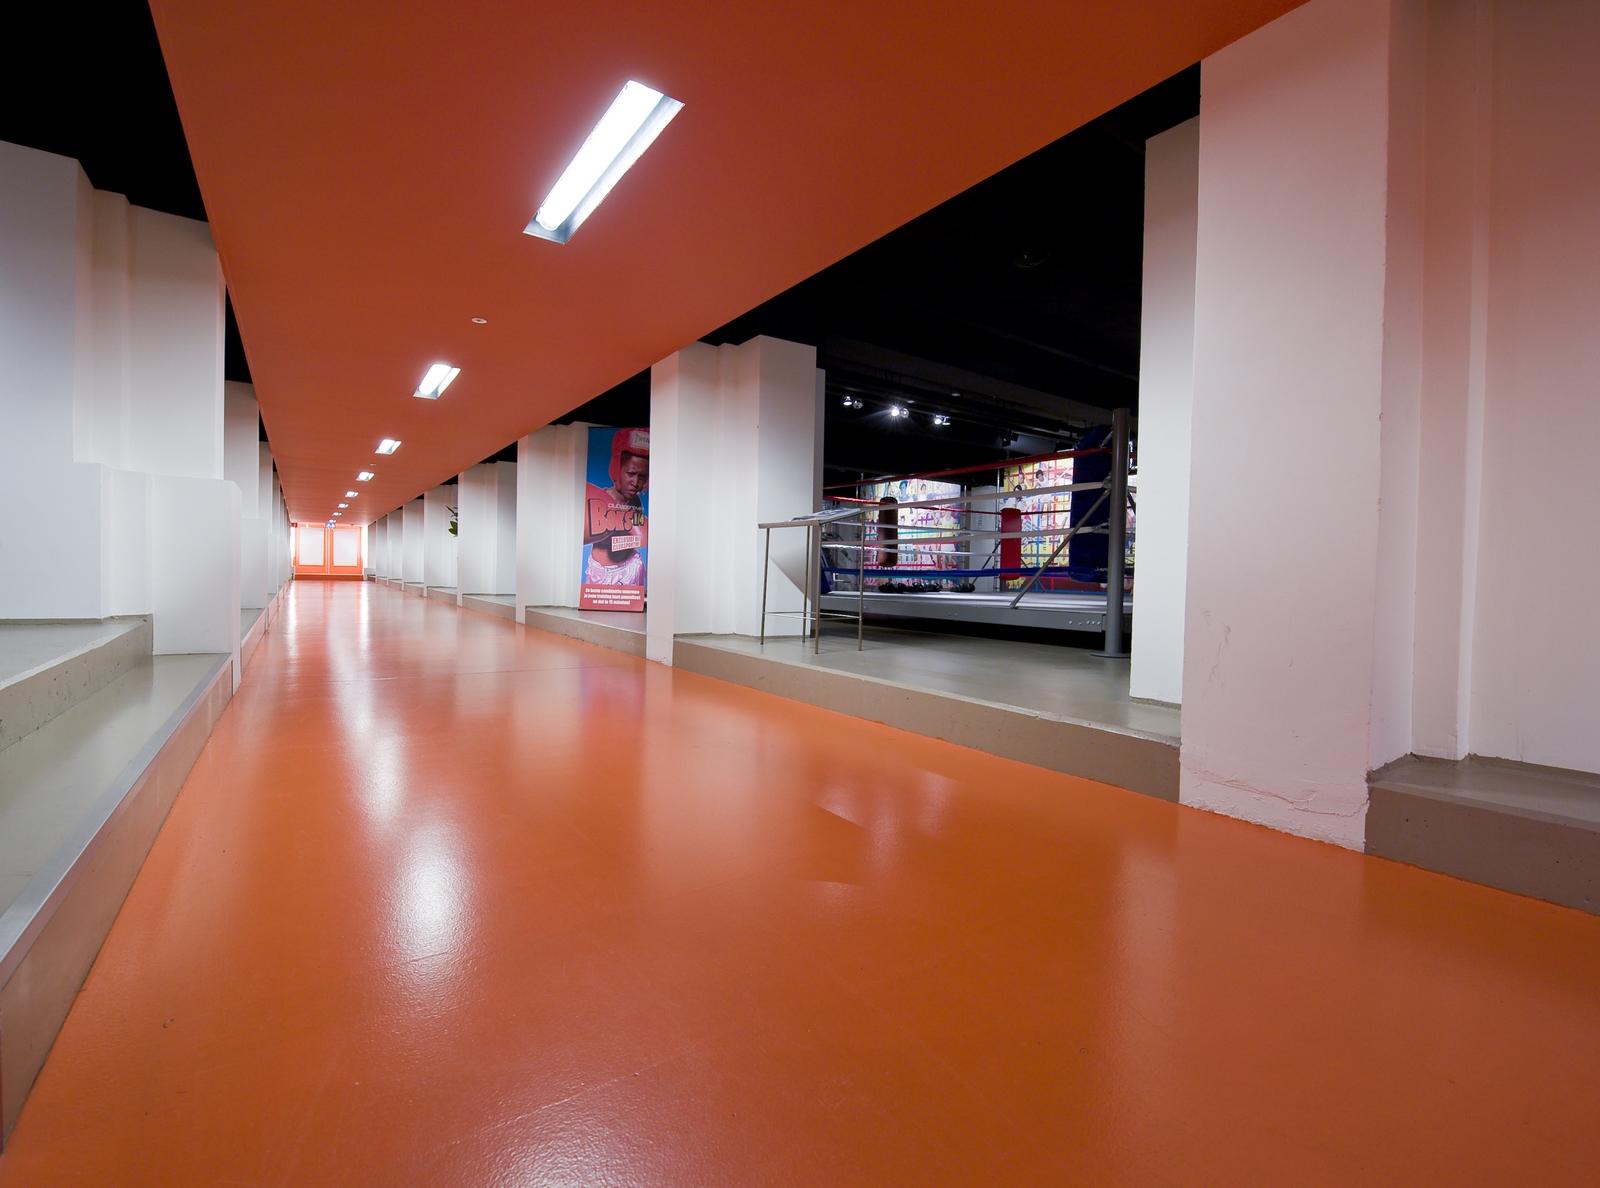 Club-Sportief-Haarlem11 (Copiar)